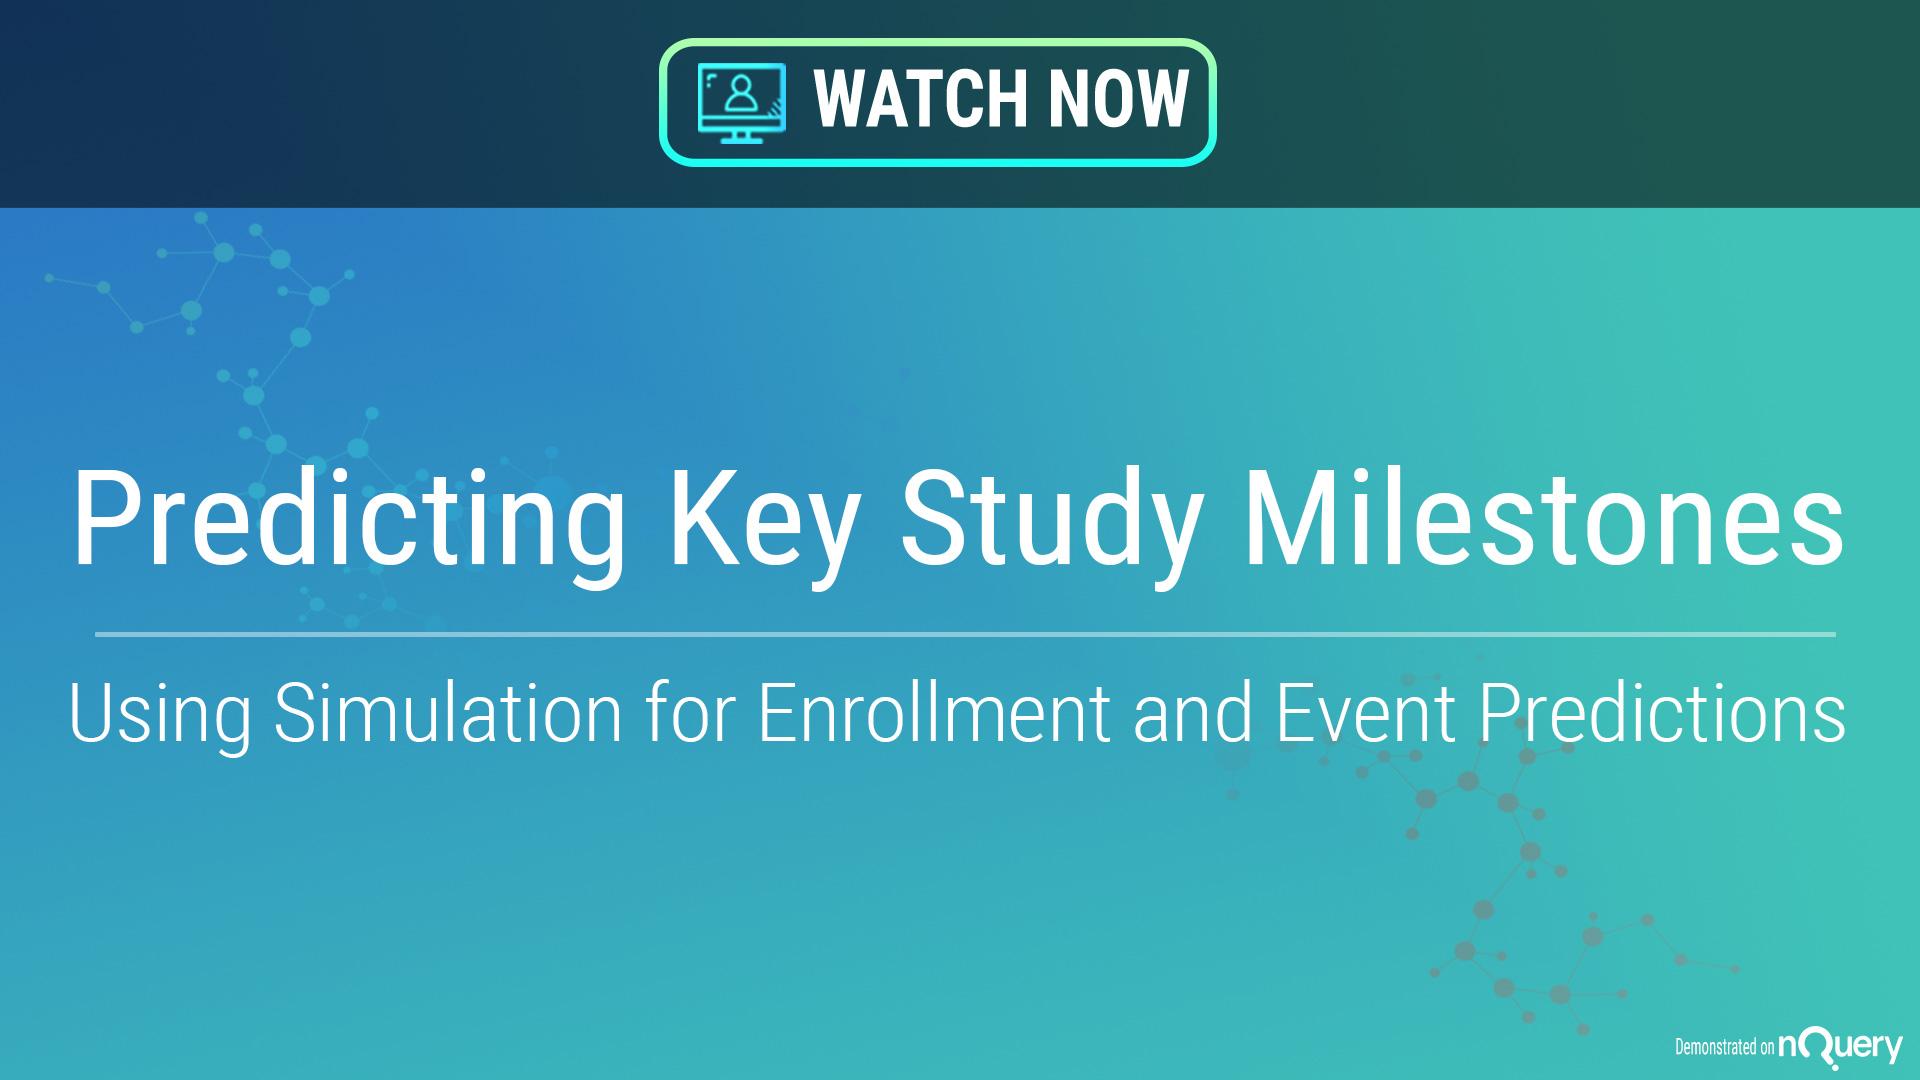 Predicting-key-study-milestones-watch-now